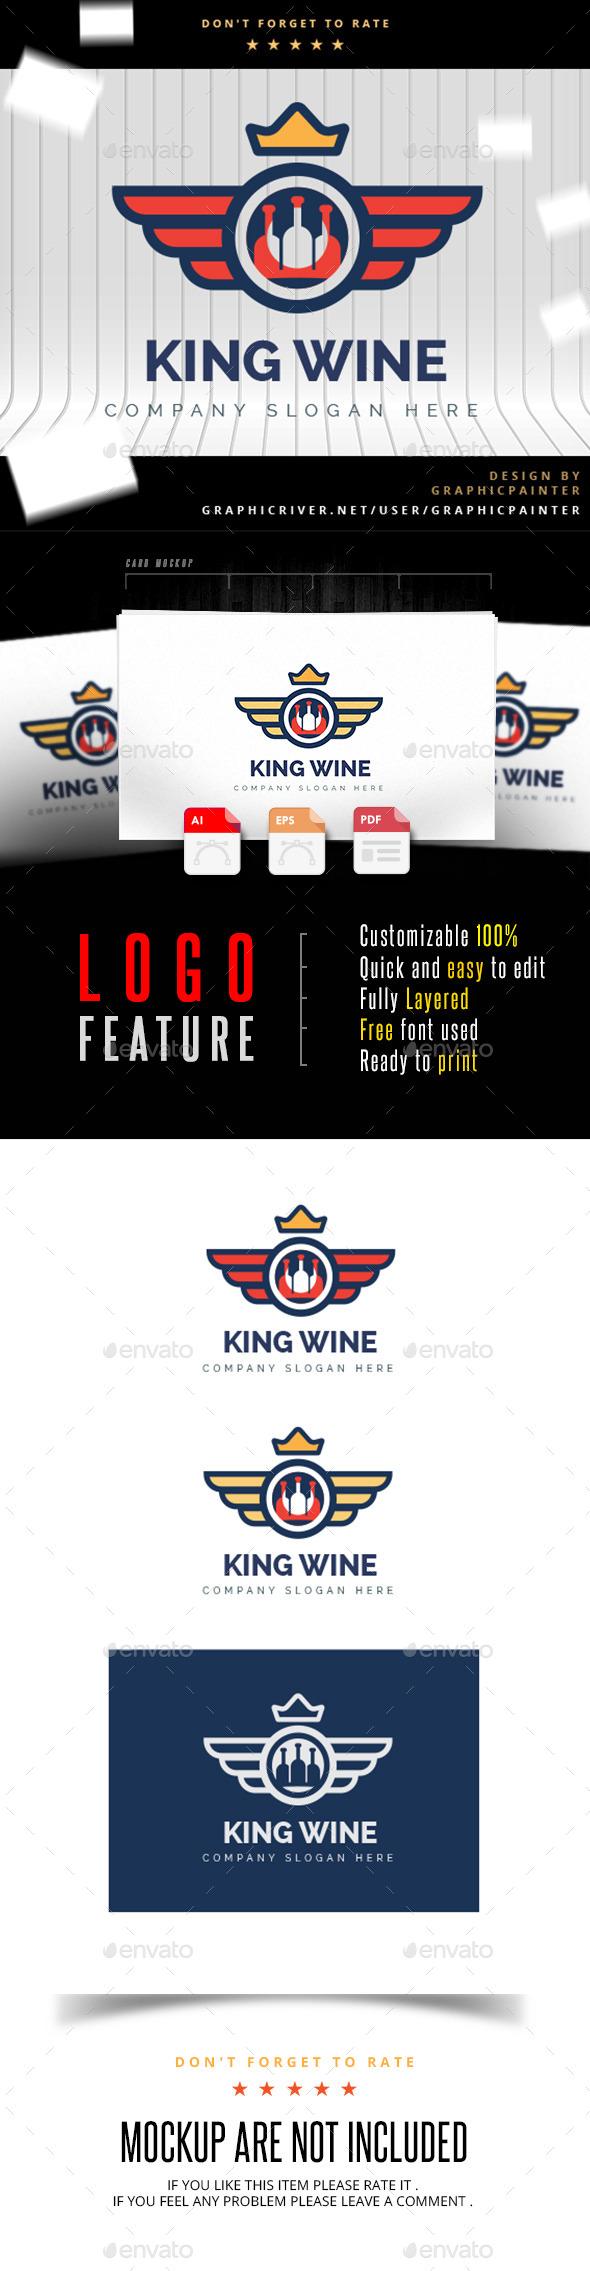 GraphicRiver King Wine Wine Logo 10997079